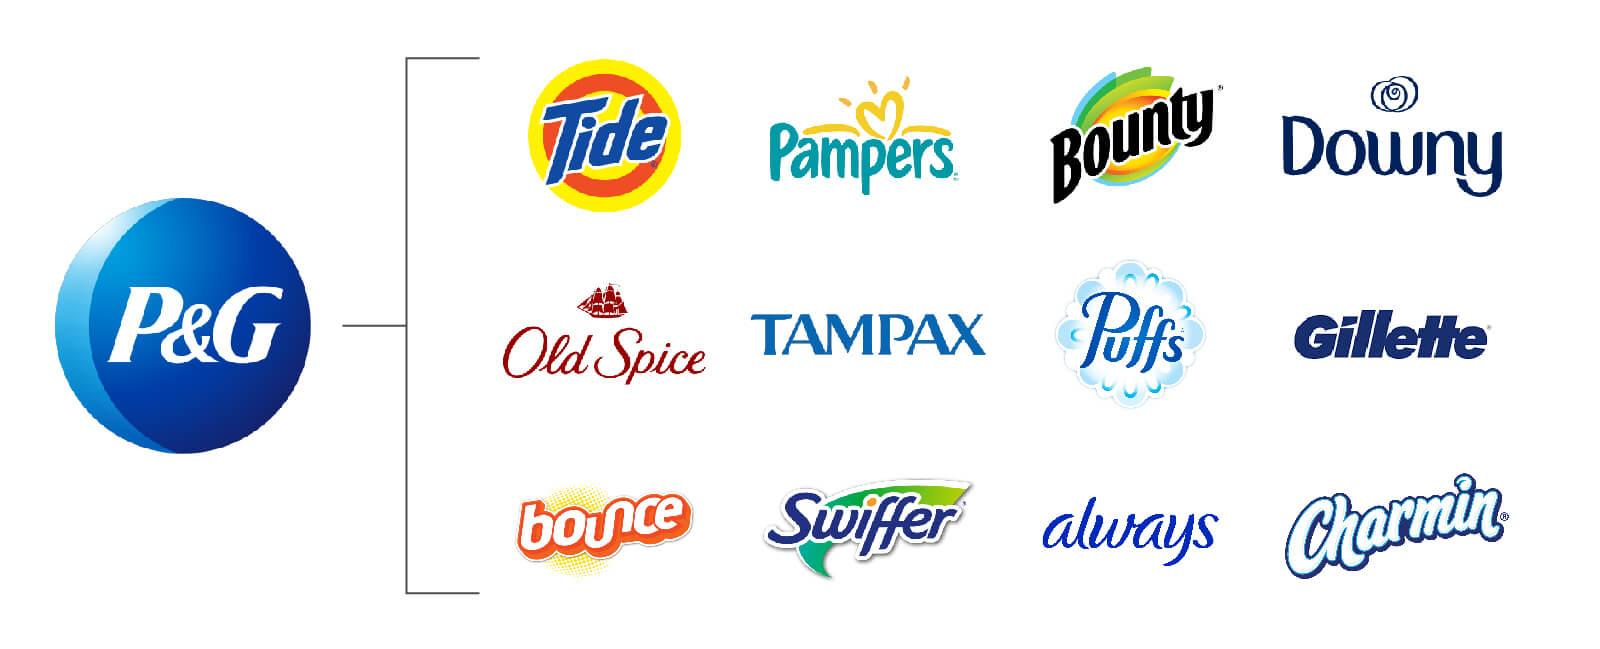 P&G Brand Architecture Chart